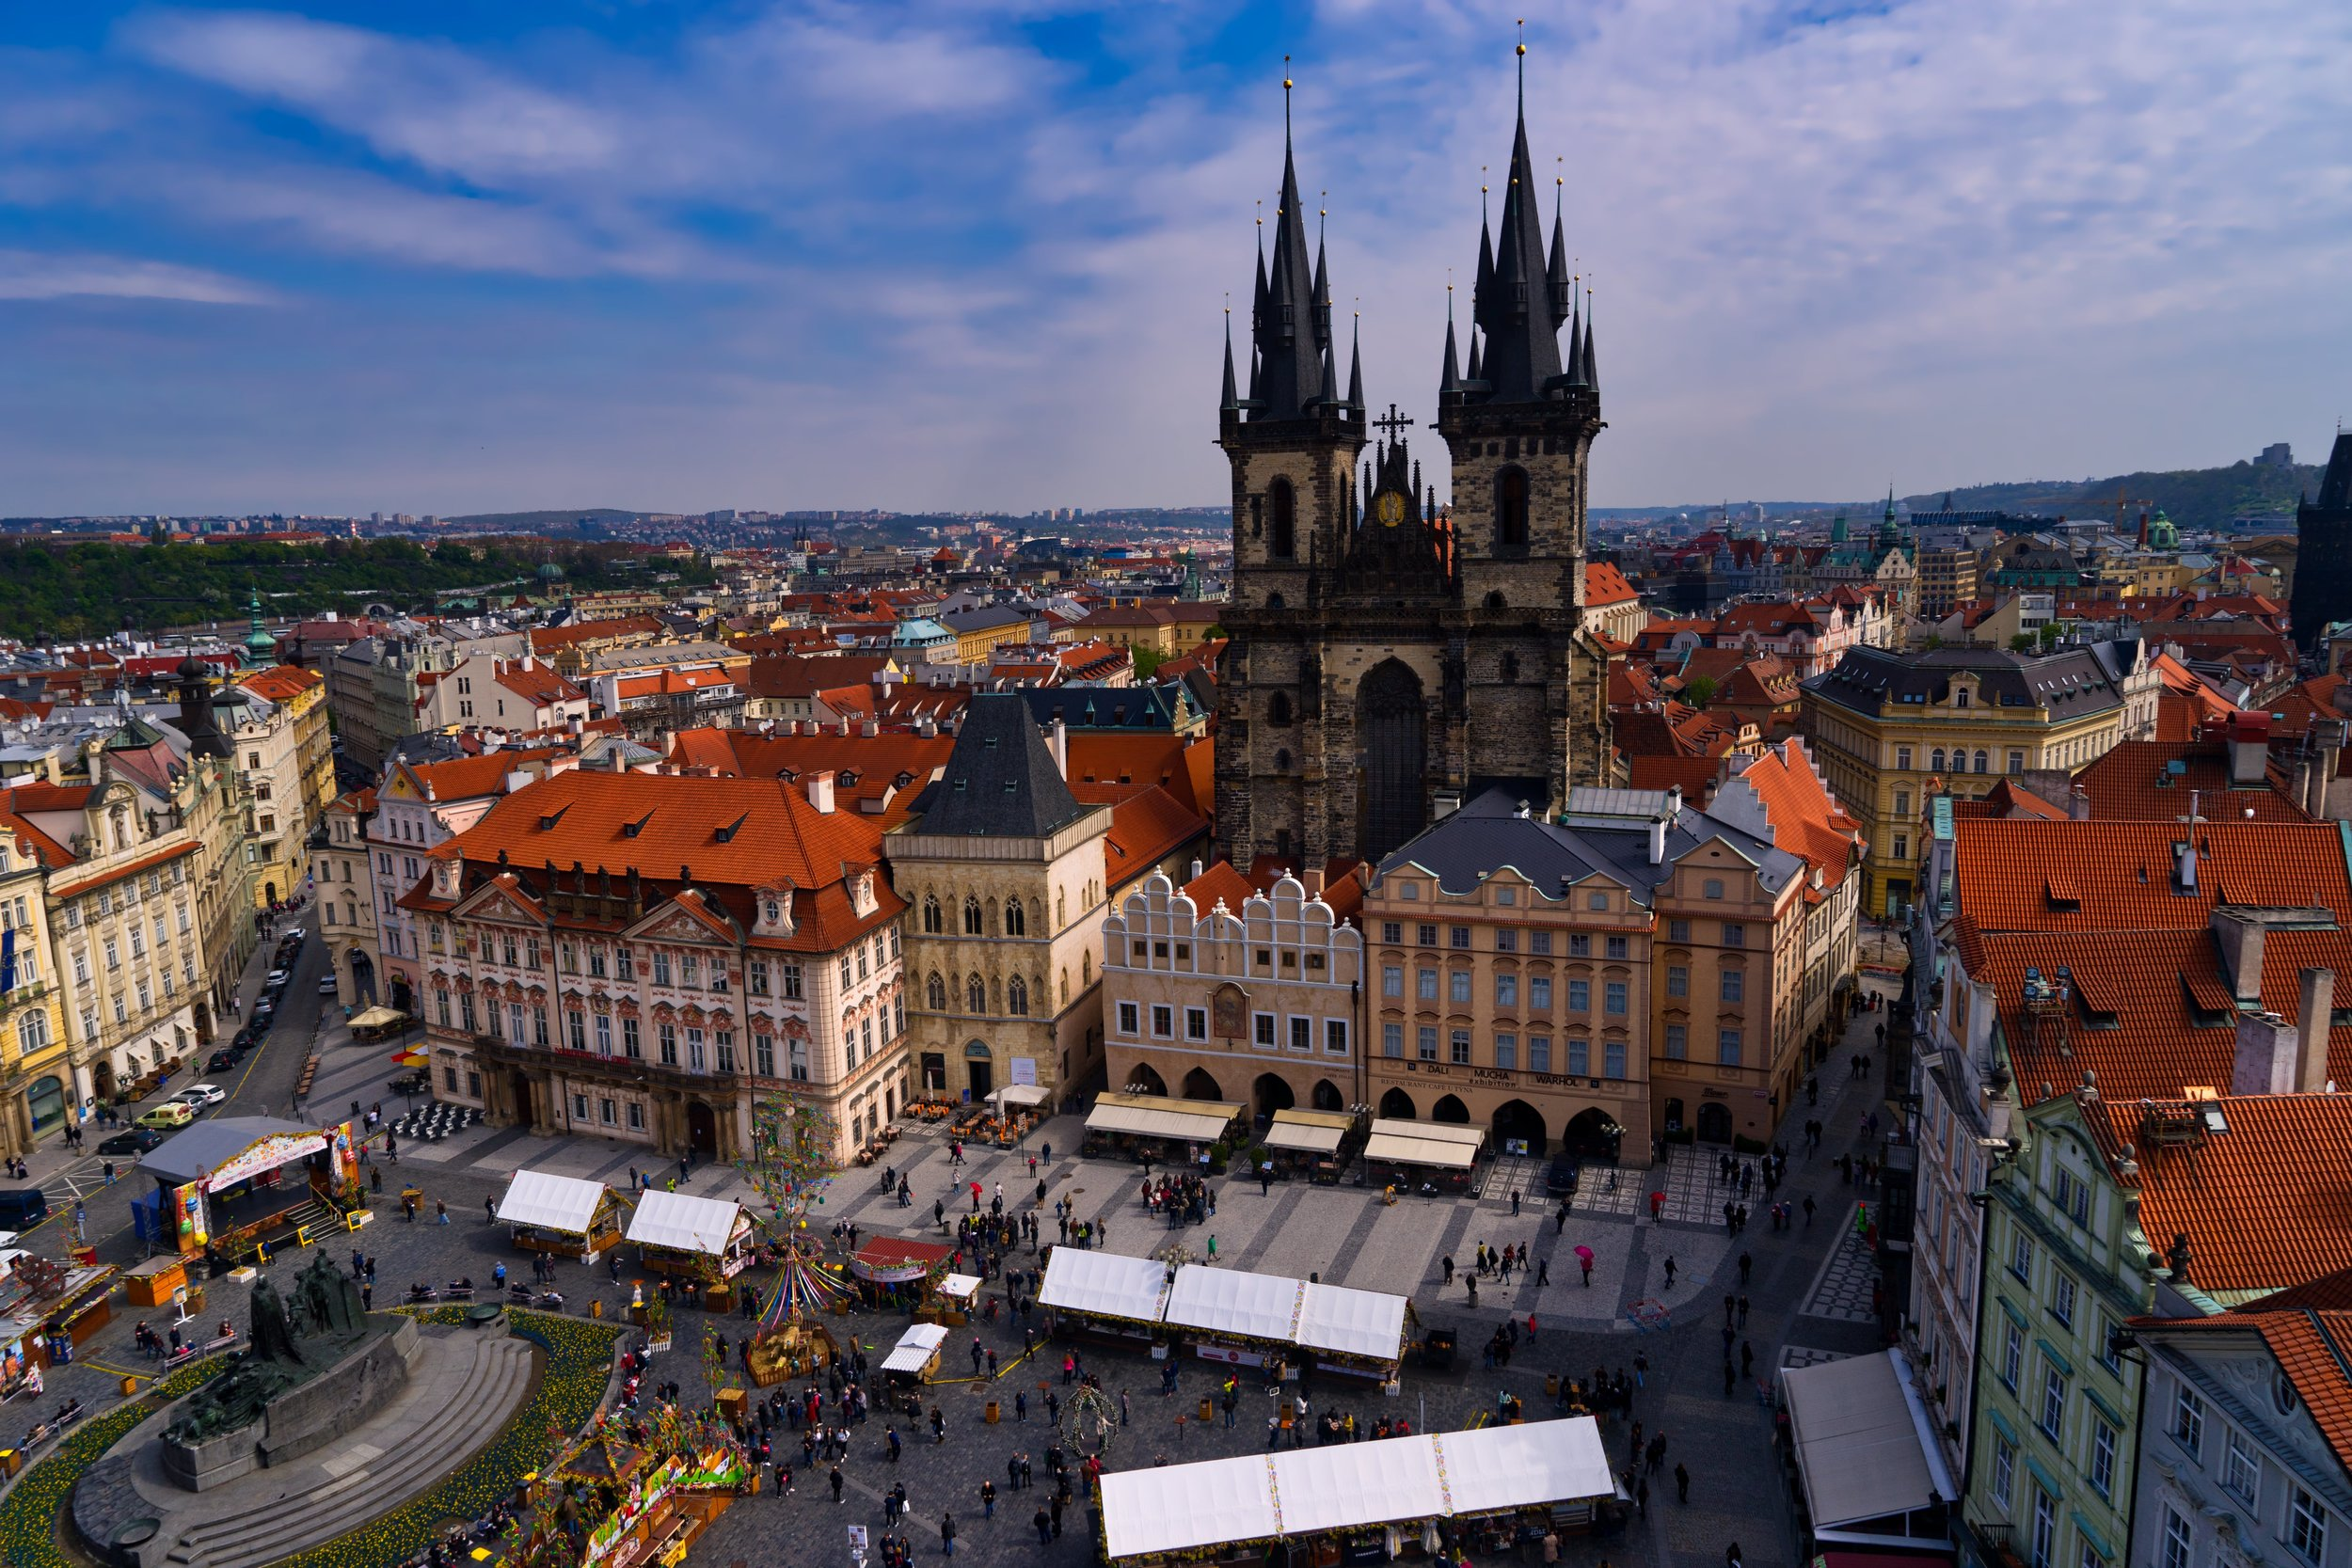 Prague-CZ-Tyn-Church-view.jpeg